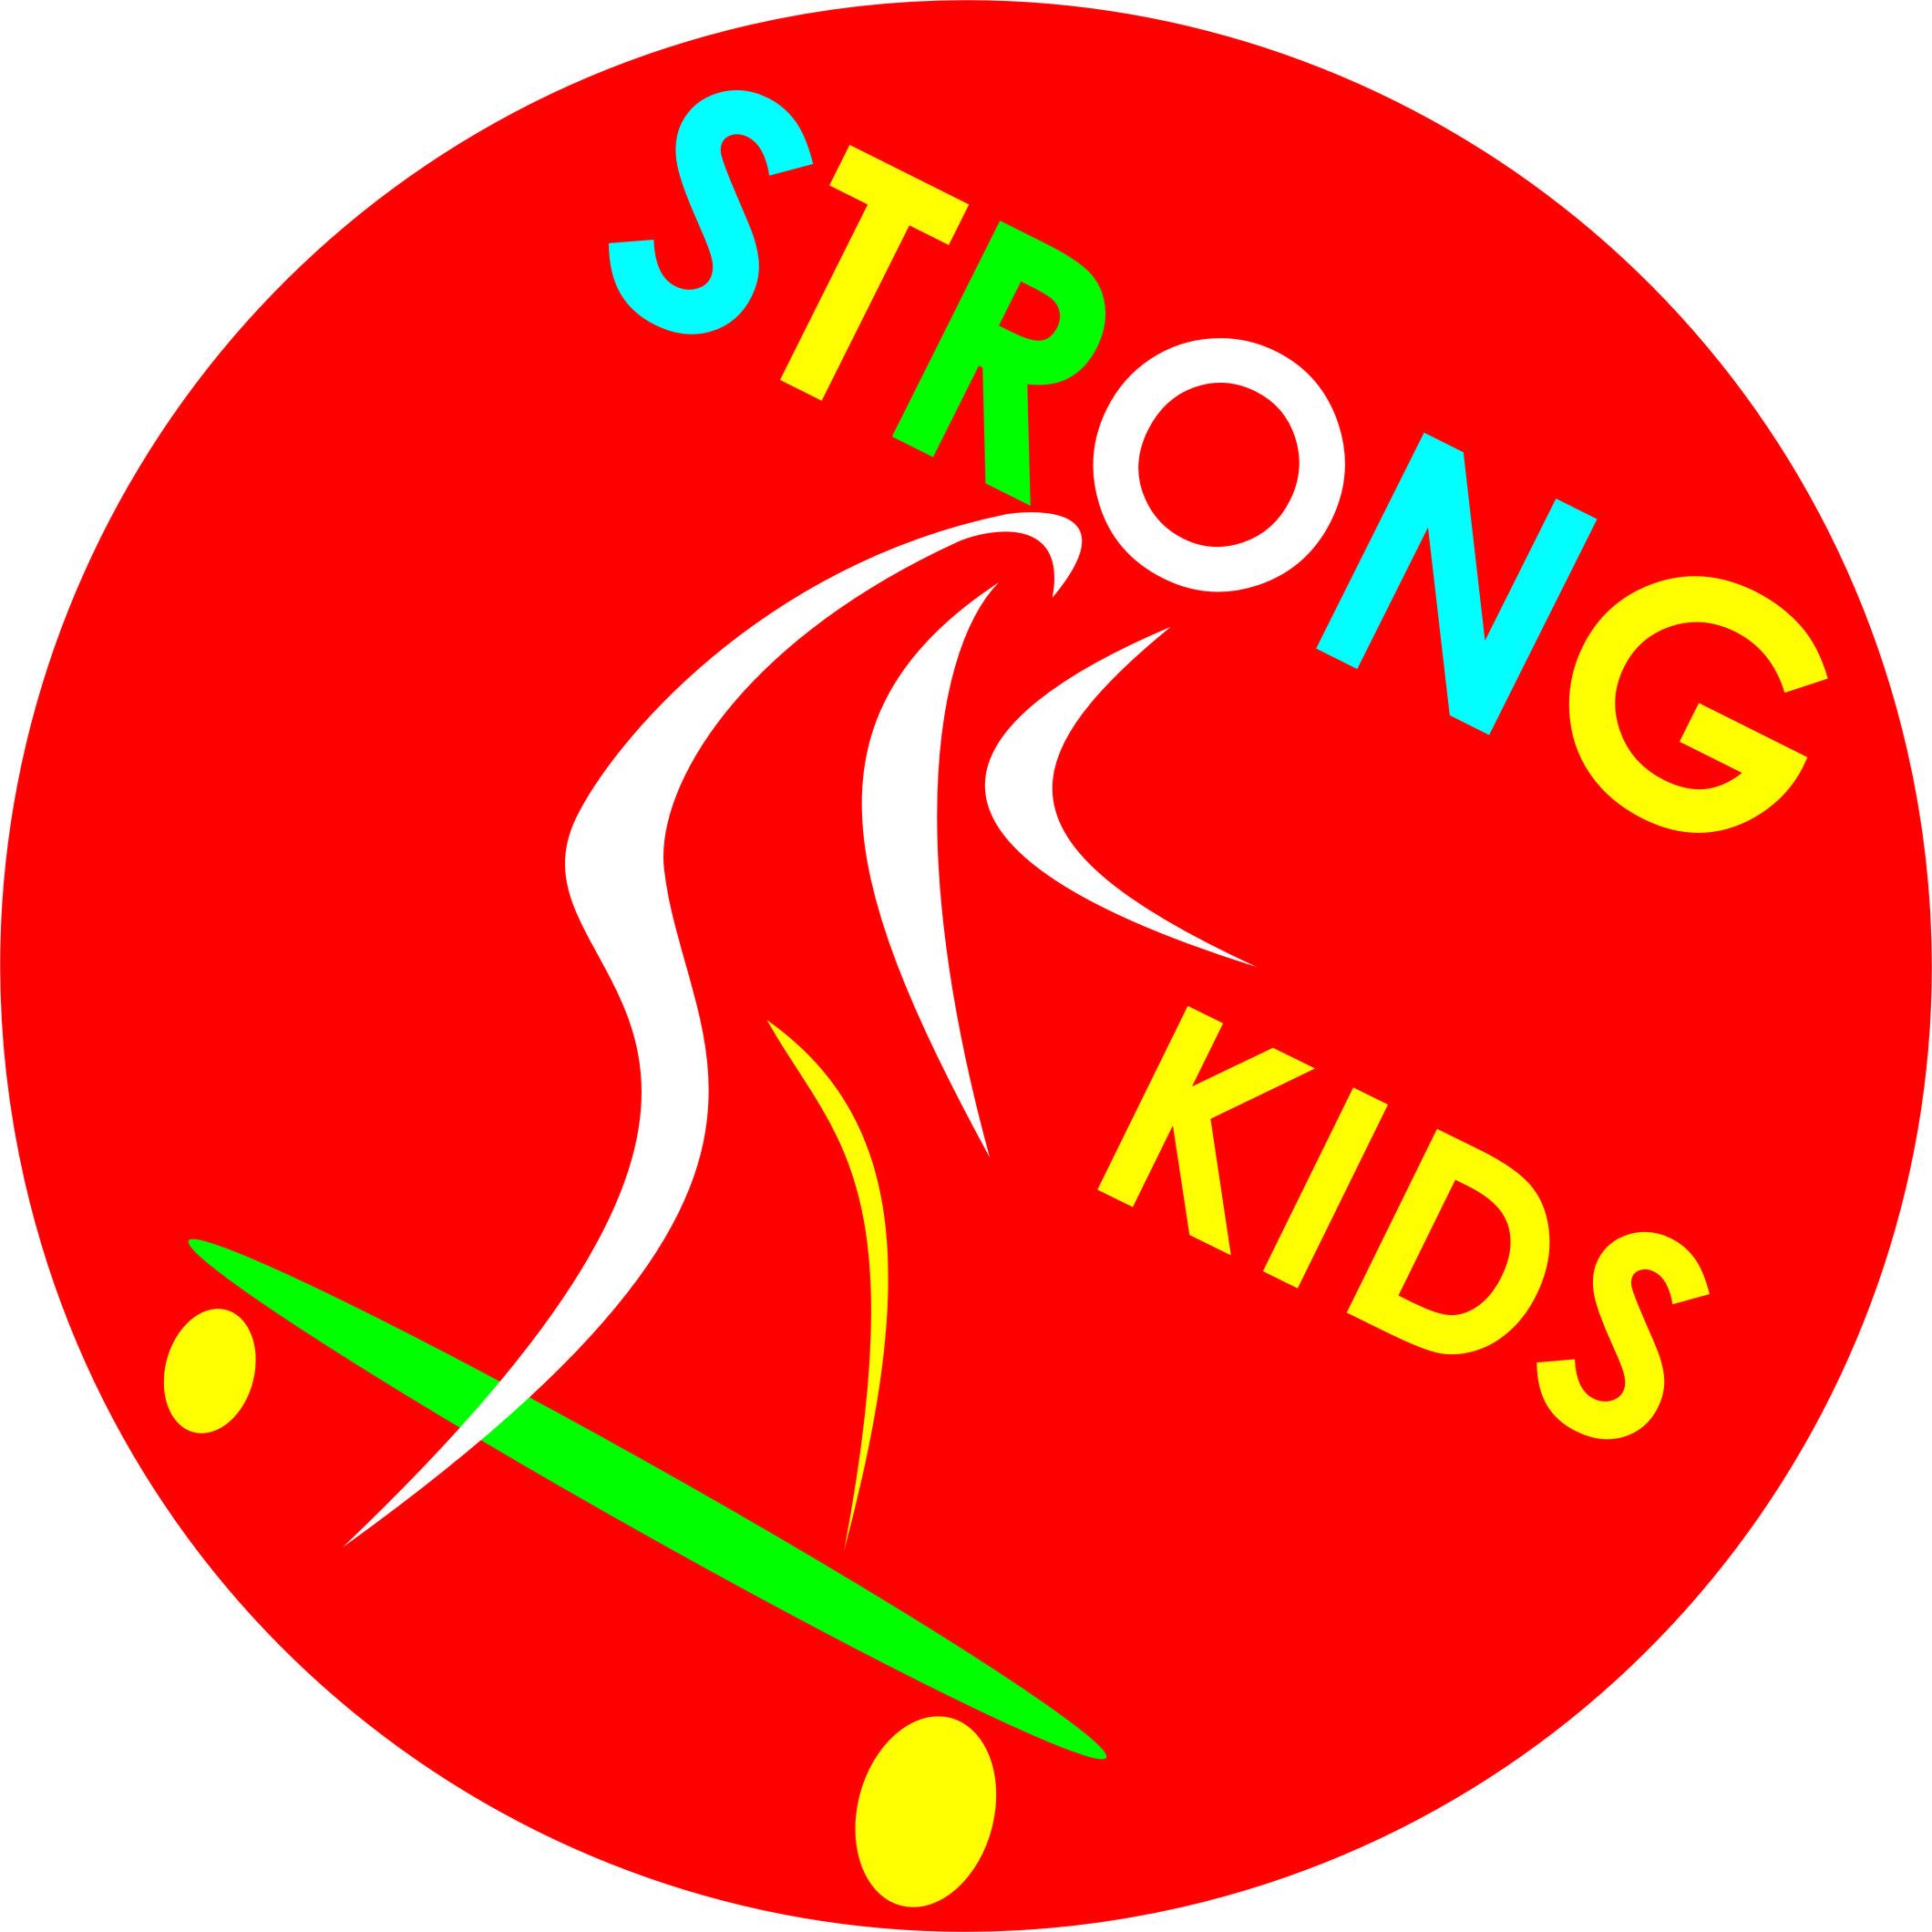 Логотип для Детского Интернет Магазина StrongKids фото f_1815c88509c944b3.jpg